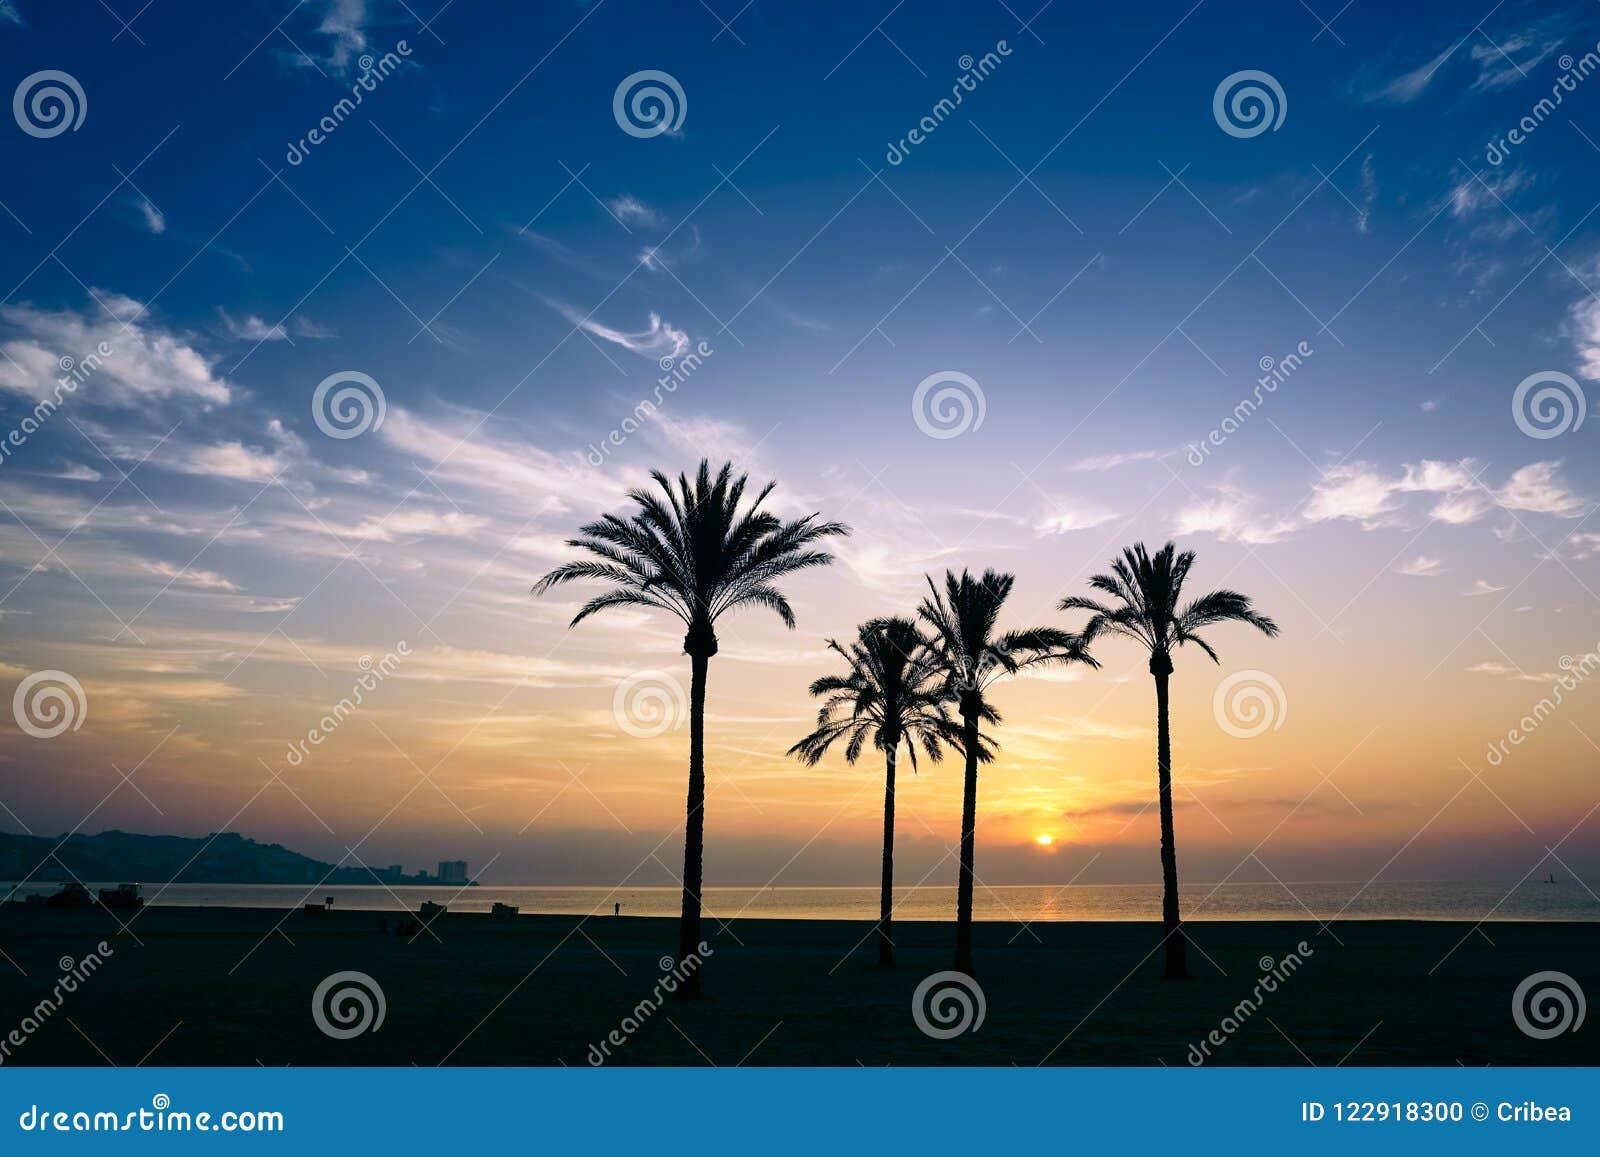 The sun rising over the horizon